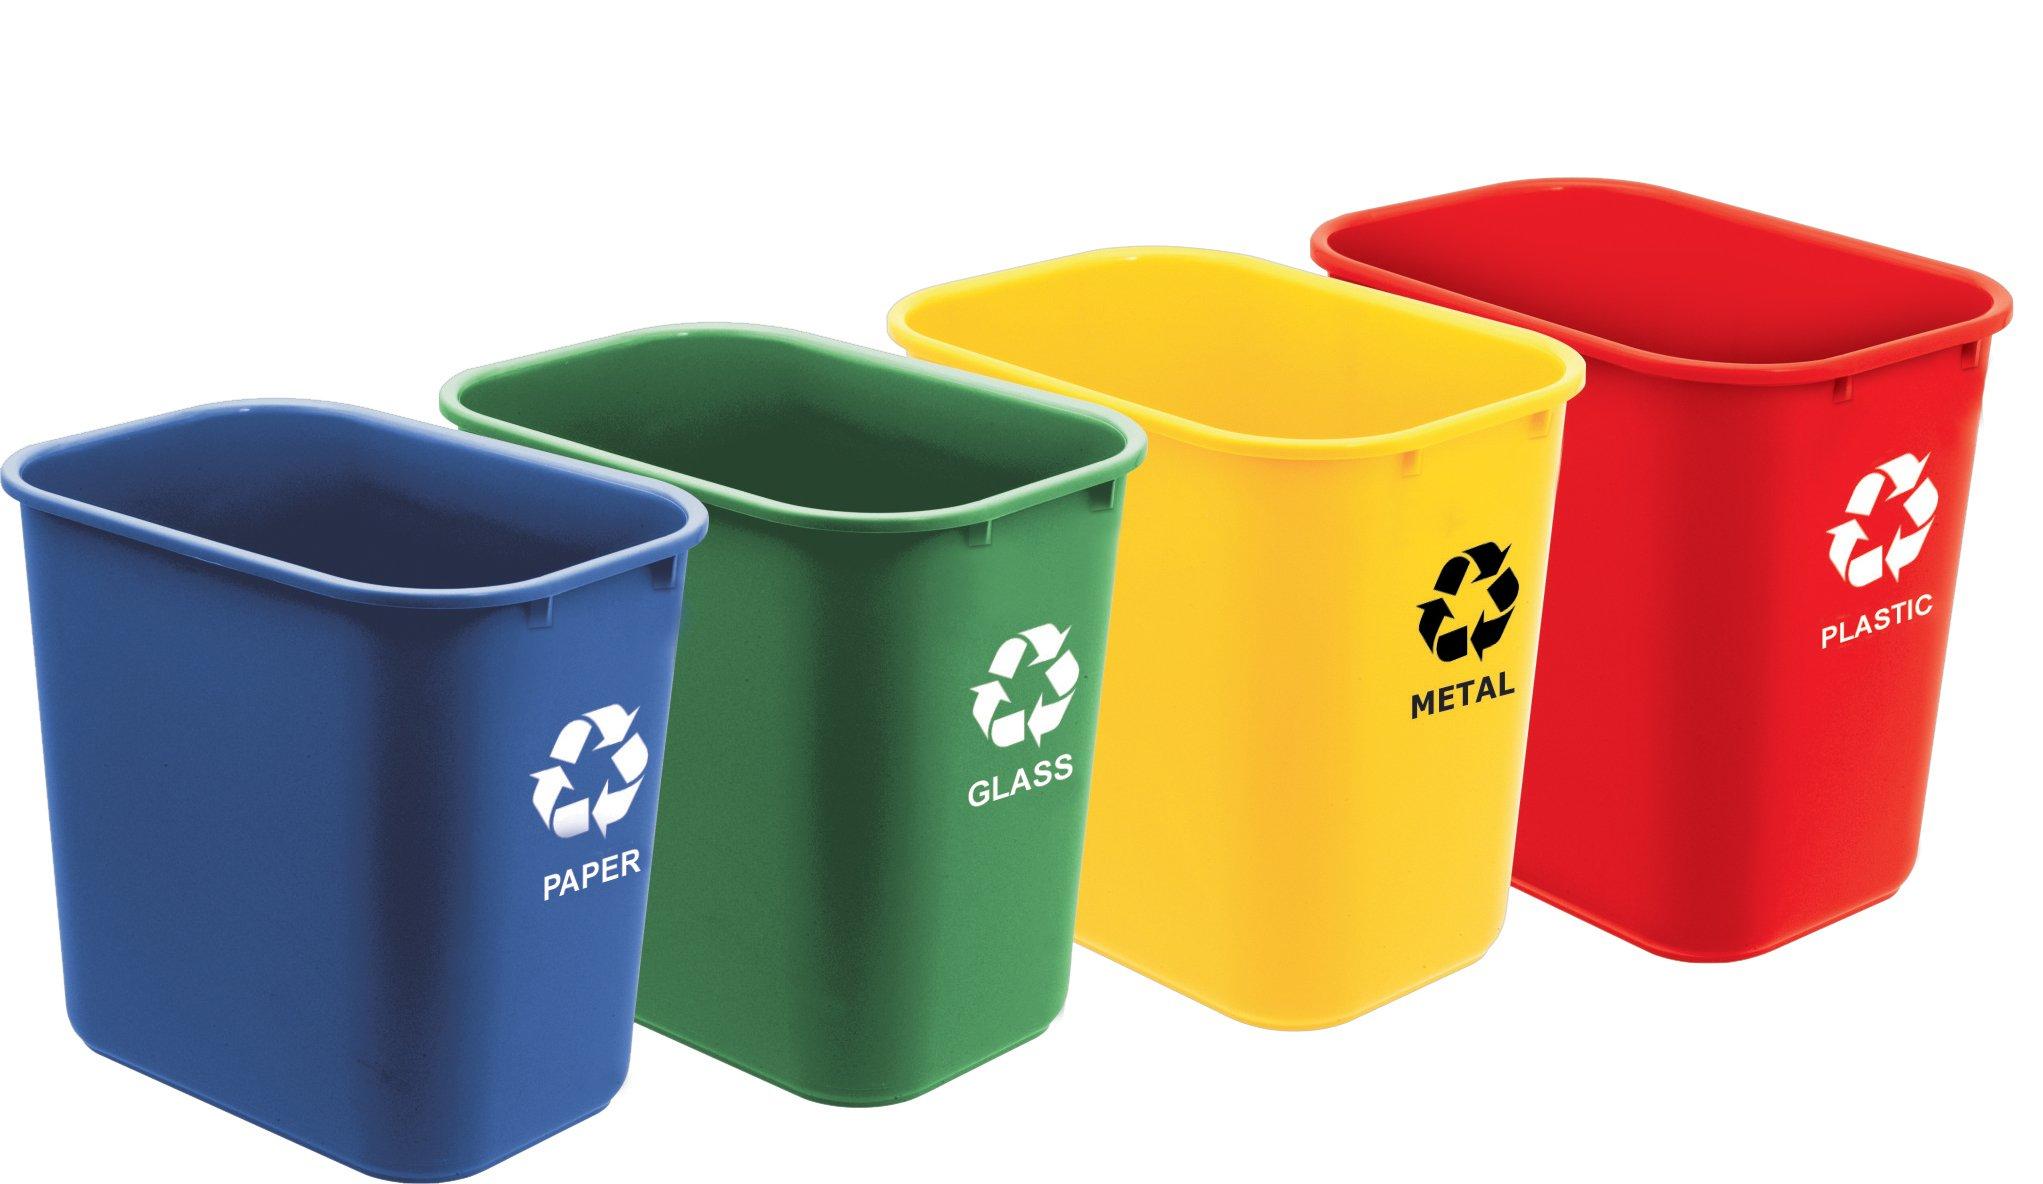 Acrimet Wastebasket for Recycling 27QT (4 Units) by Acrimet